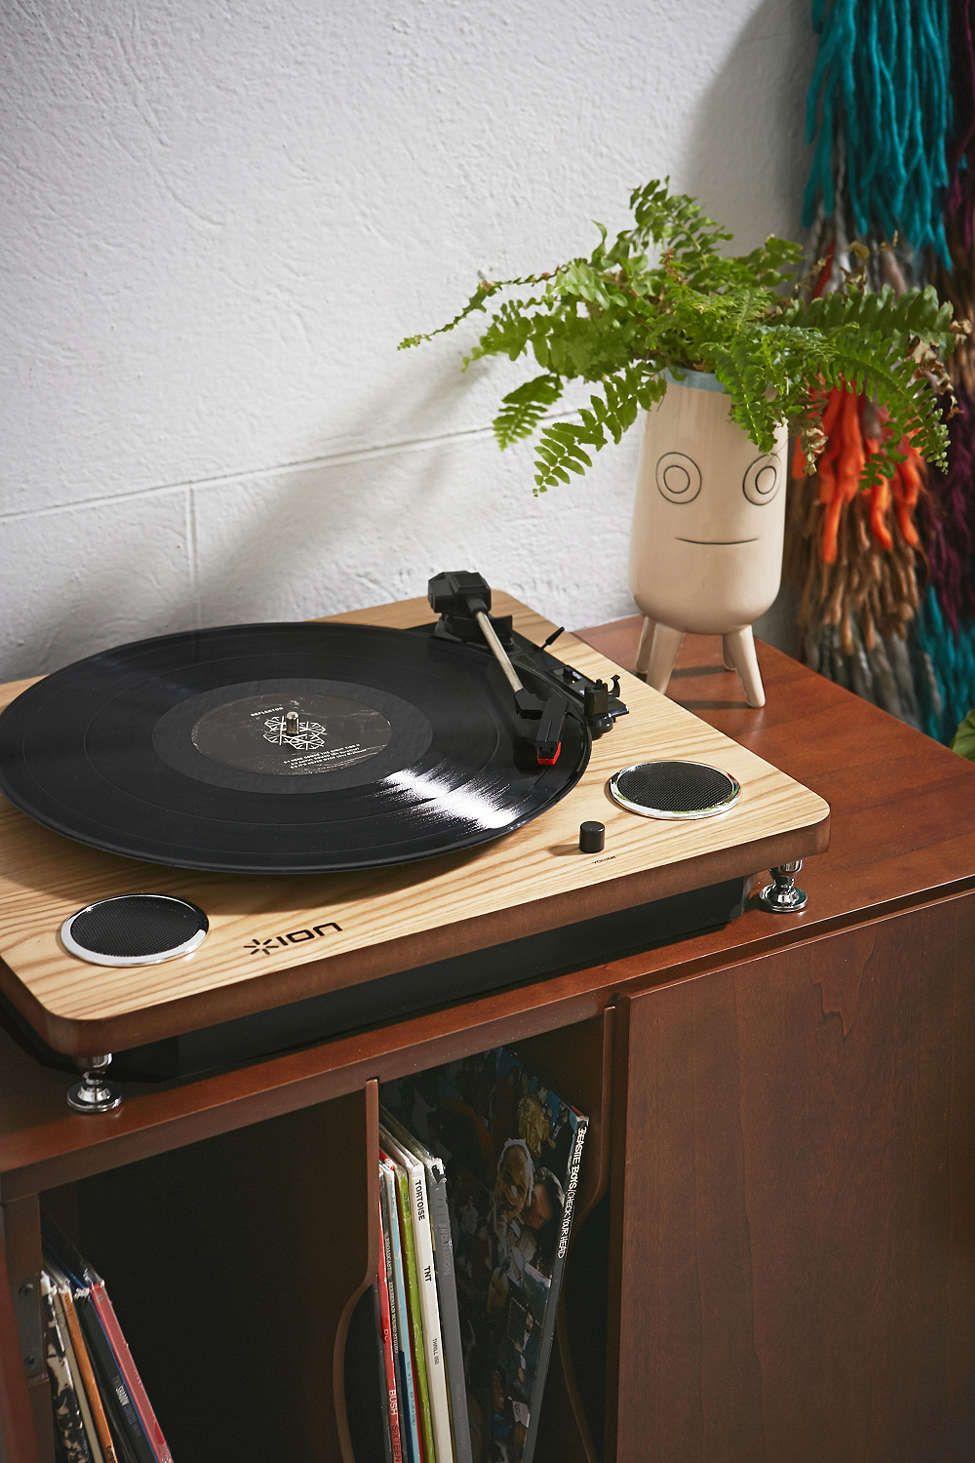 Ion Pro Sound Usb Vinyl Record Player Vinyl Record Player Record Player Usb Vinyl